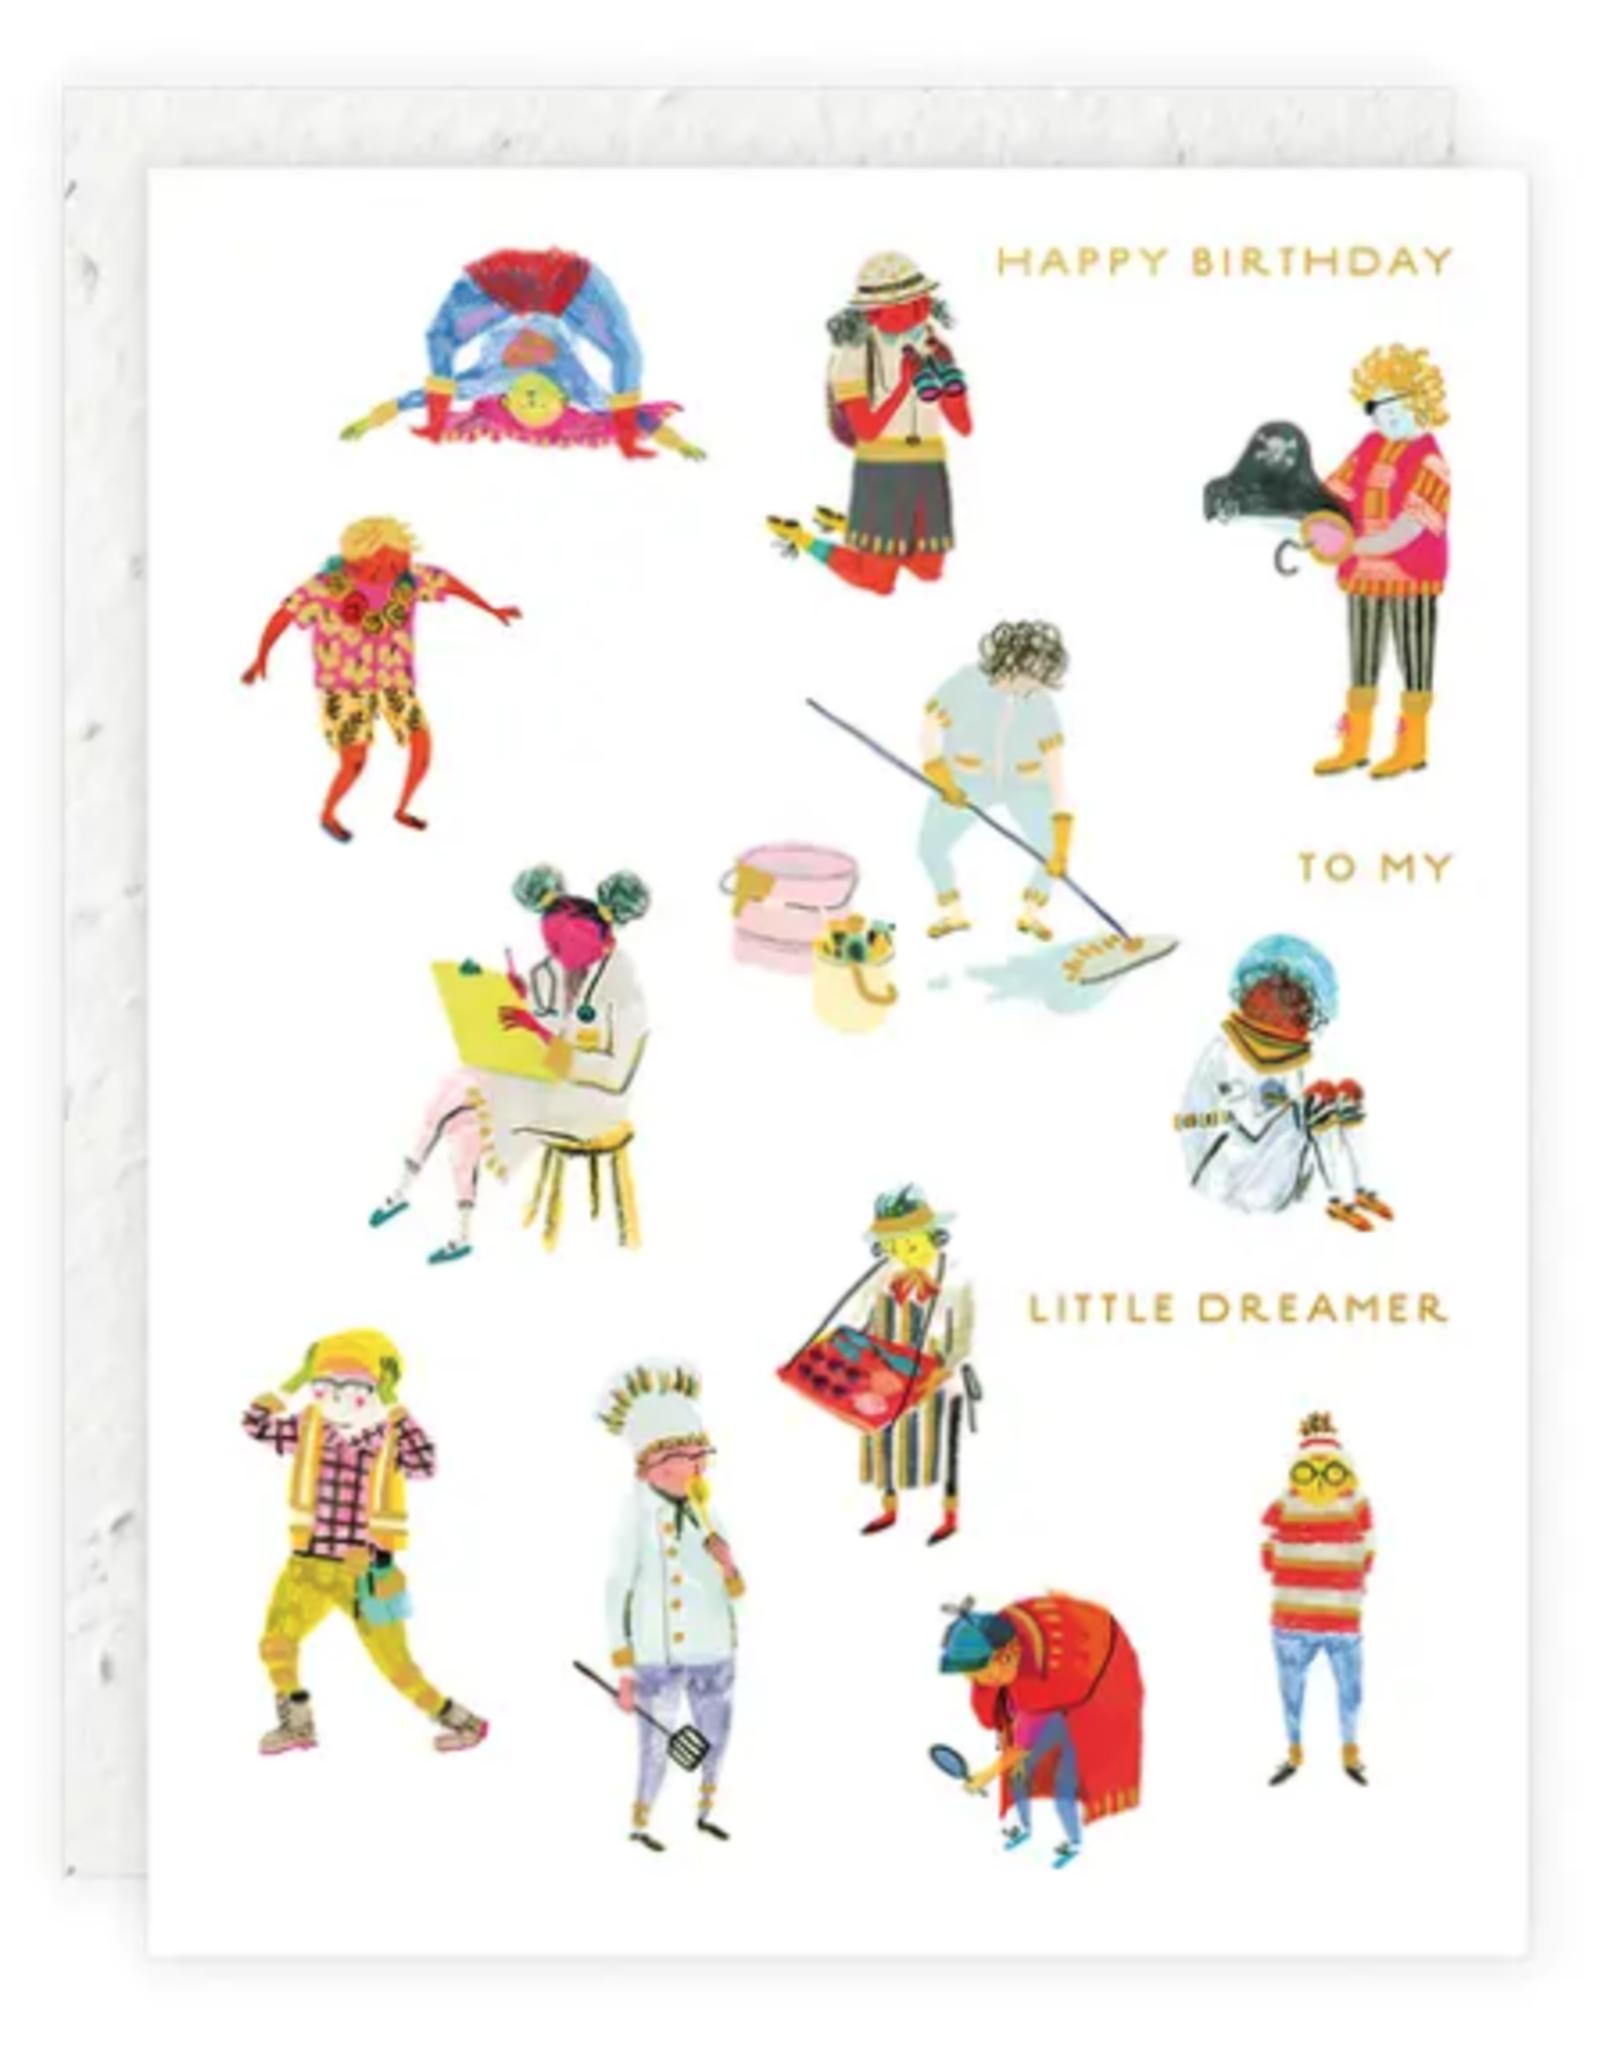 Little Dreamer Birthday Card